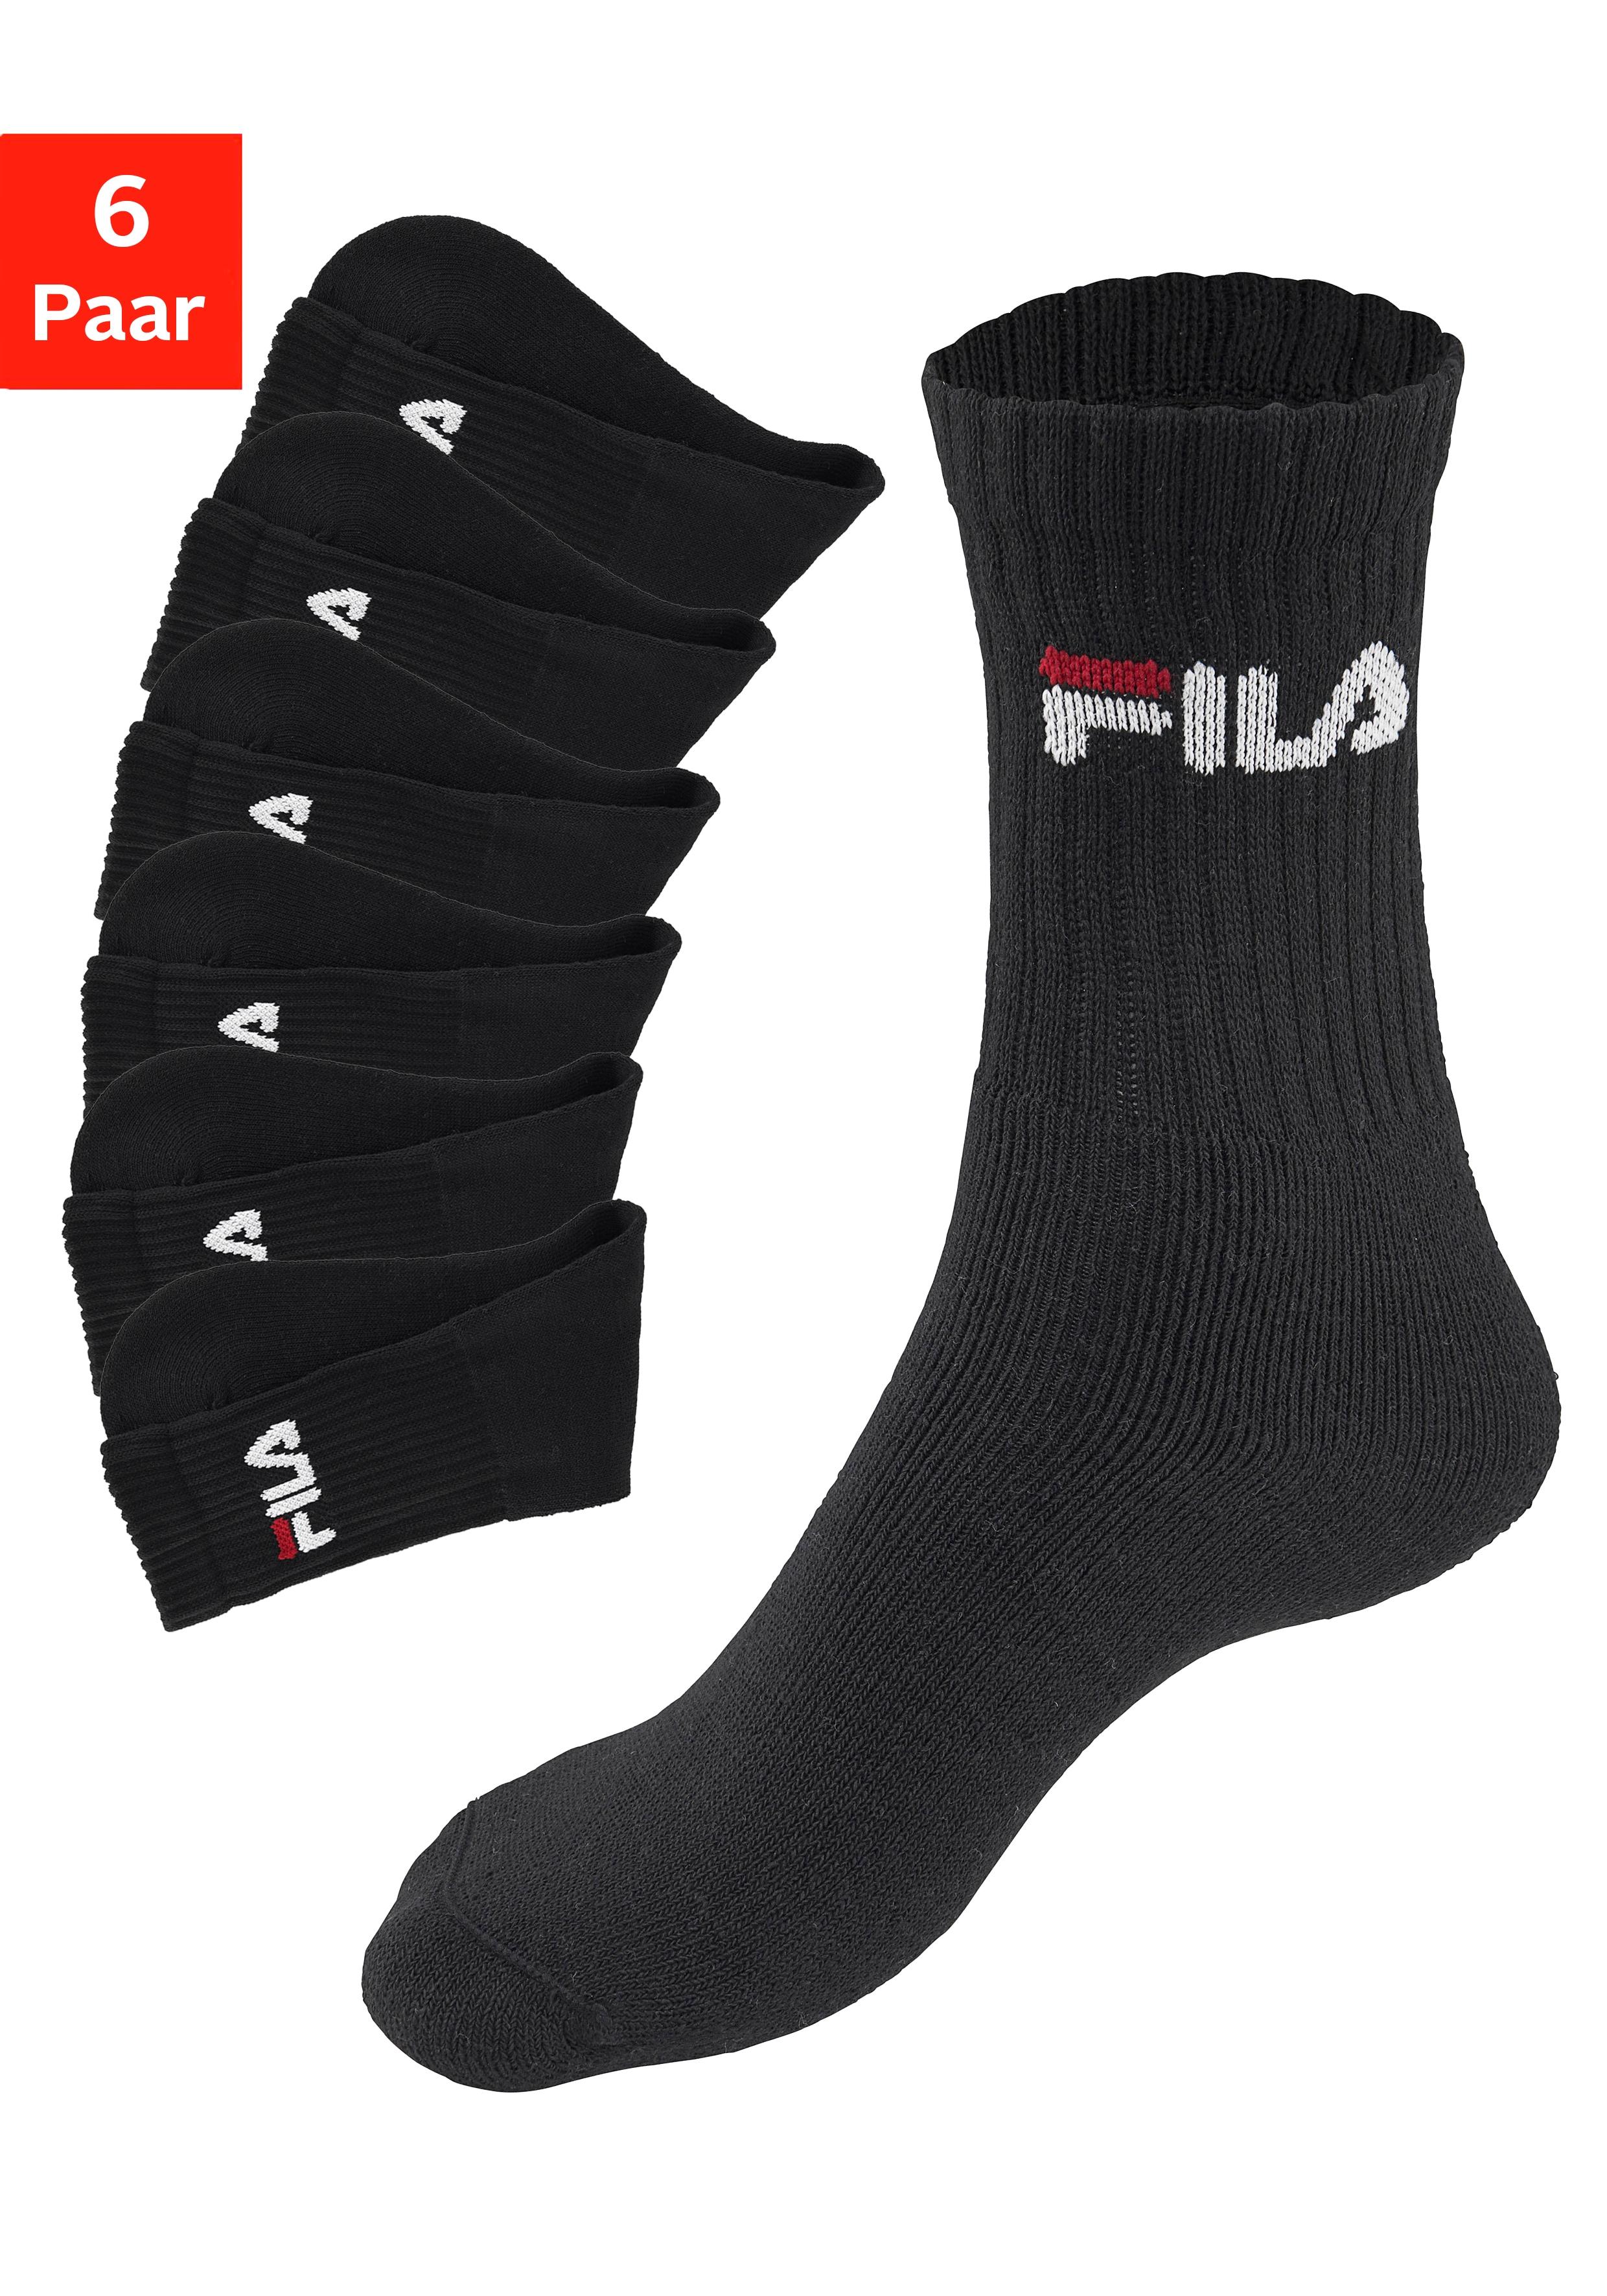 Fila Tennissocken (6 Paar) Damenmode/Wäsche & Bademode/Damenwäsche/Socken/Sportsocken/Tennissocken